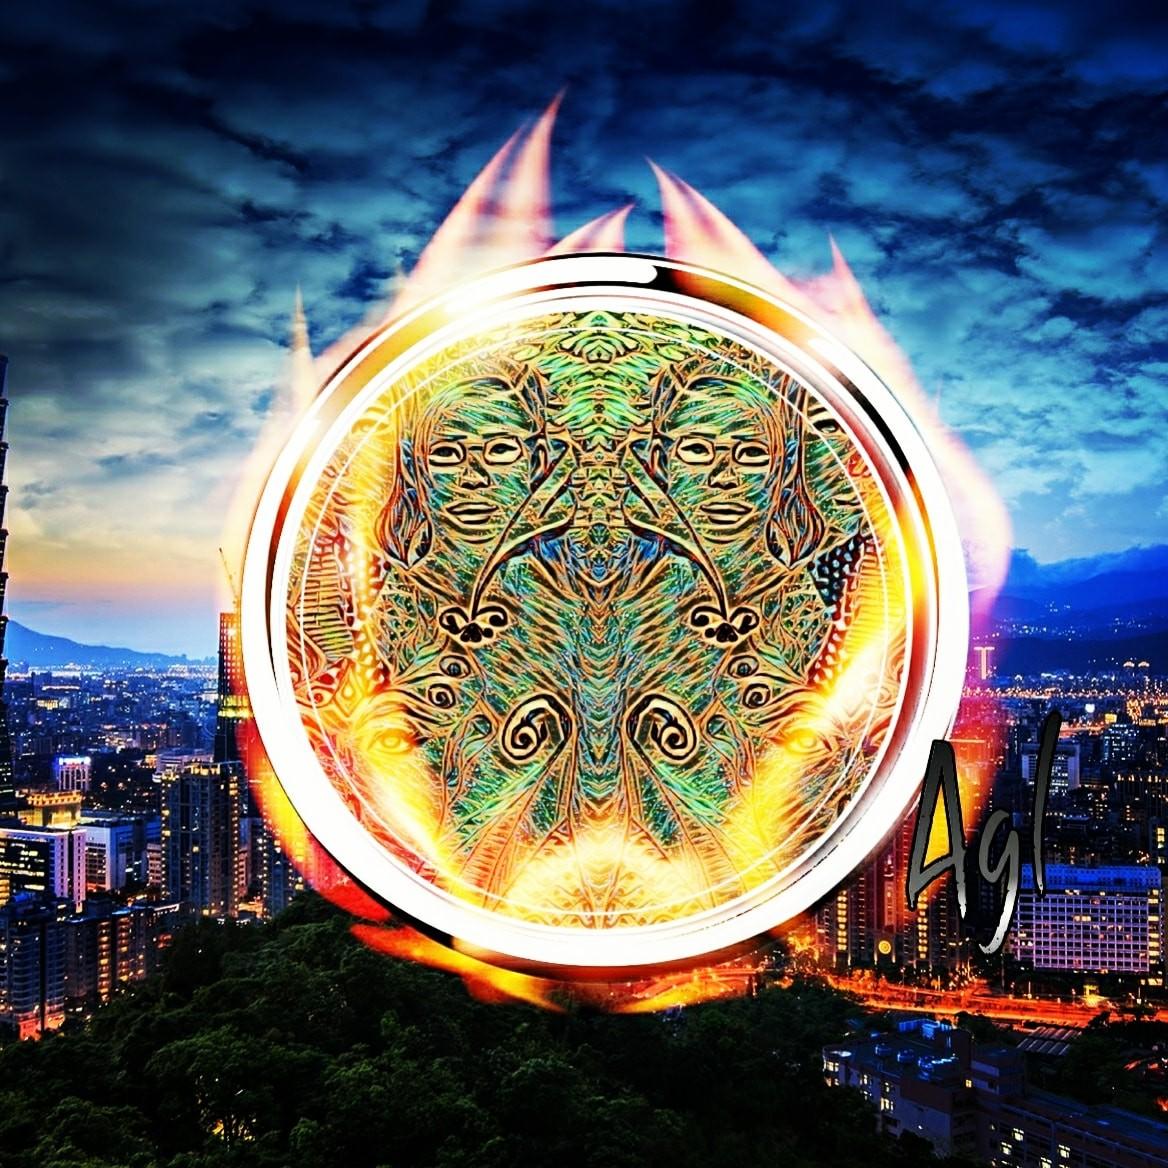 Agl - Boule de feu